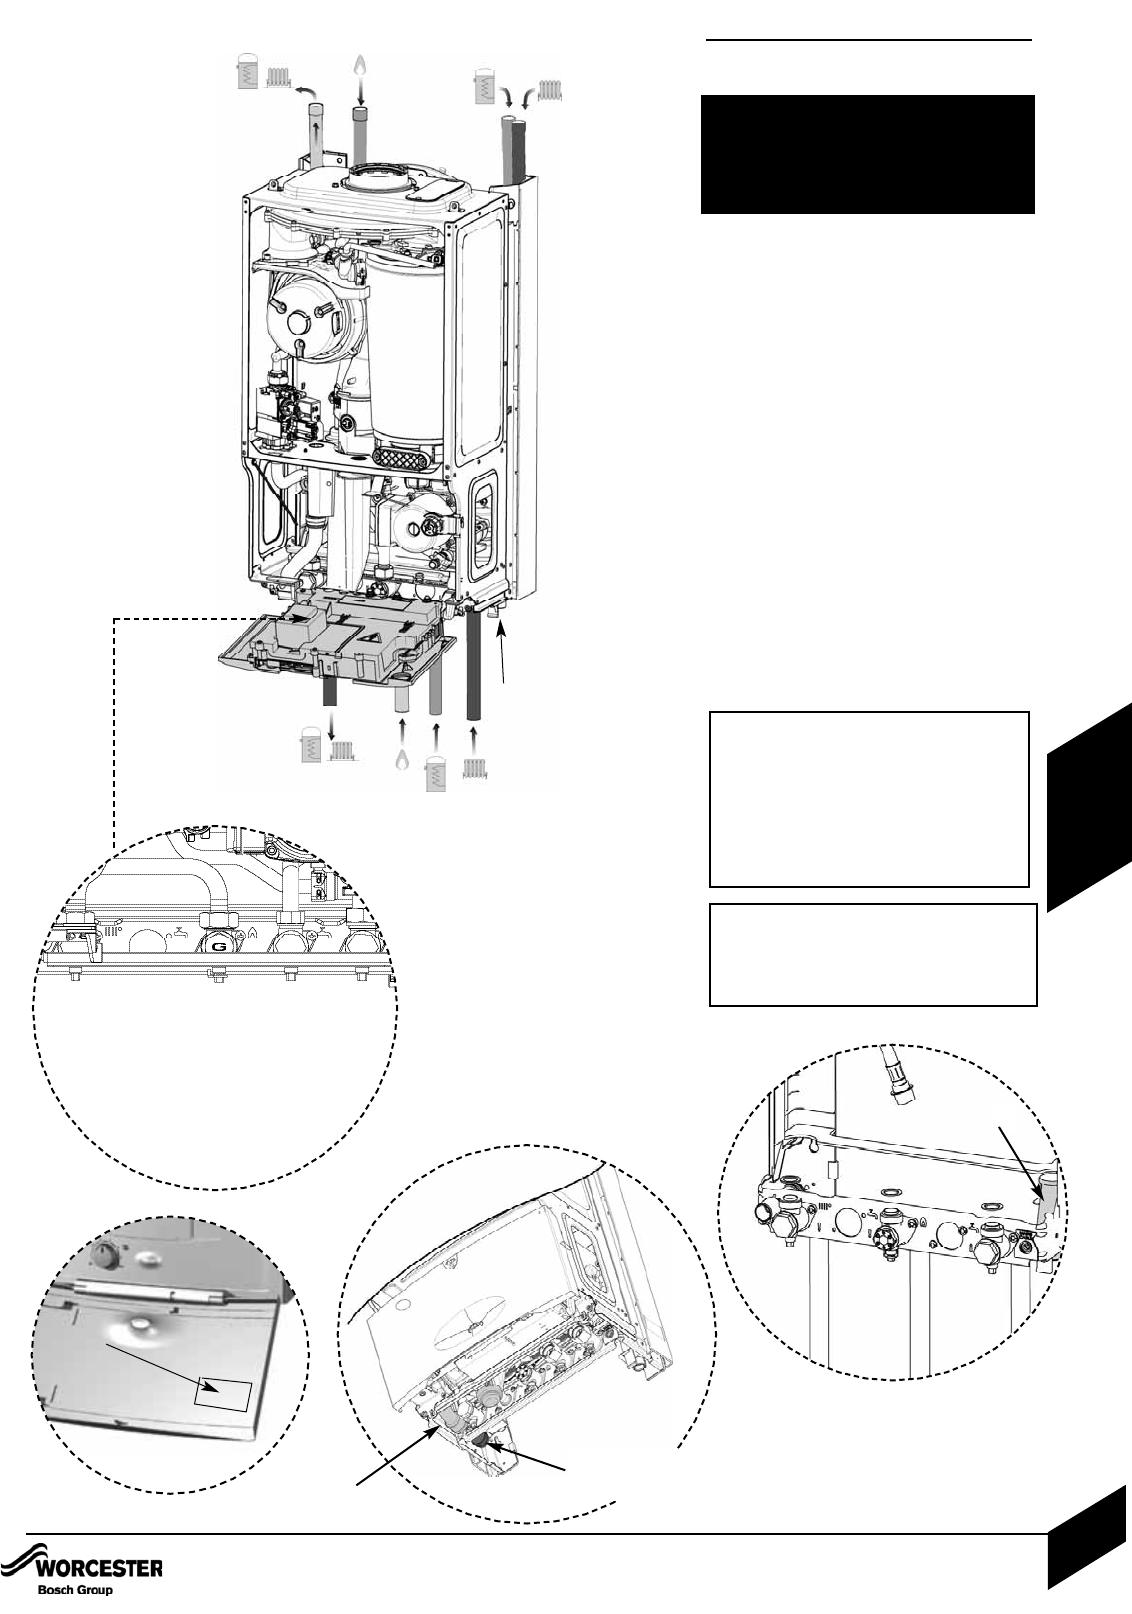 worcester bosch 24i system boiler wiring diagram 208v greenstar 12 installation service servicing instructions for 12i